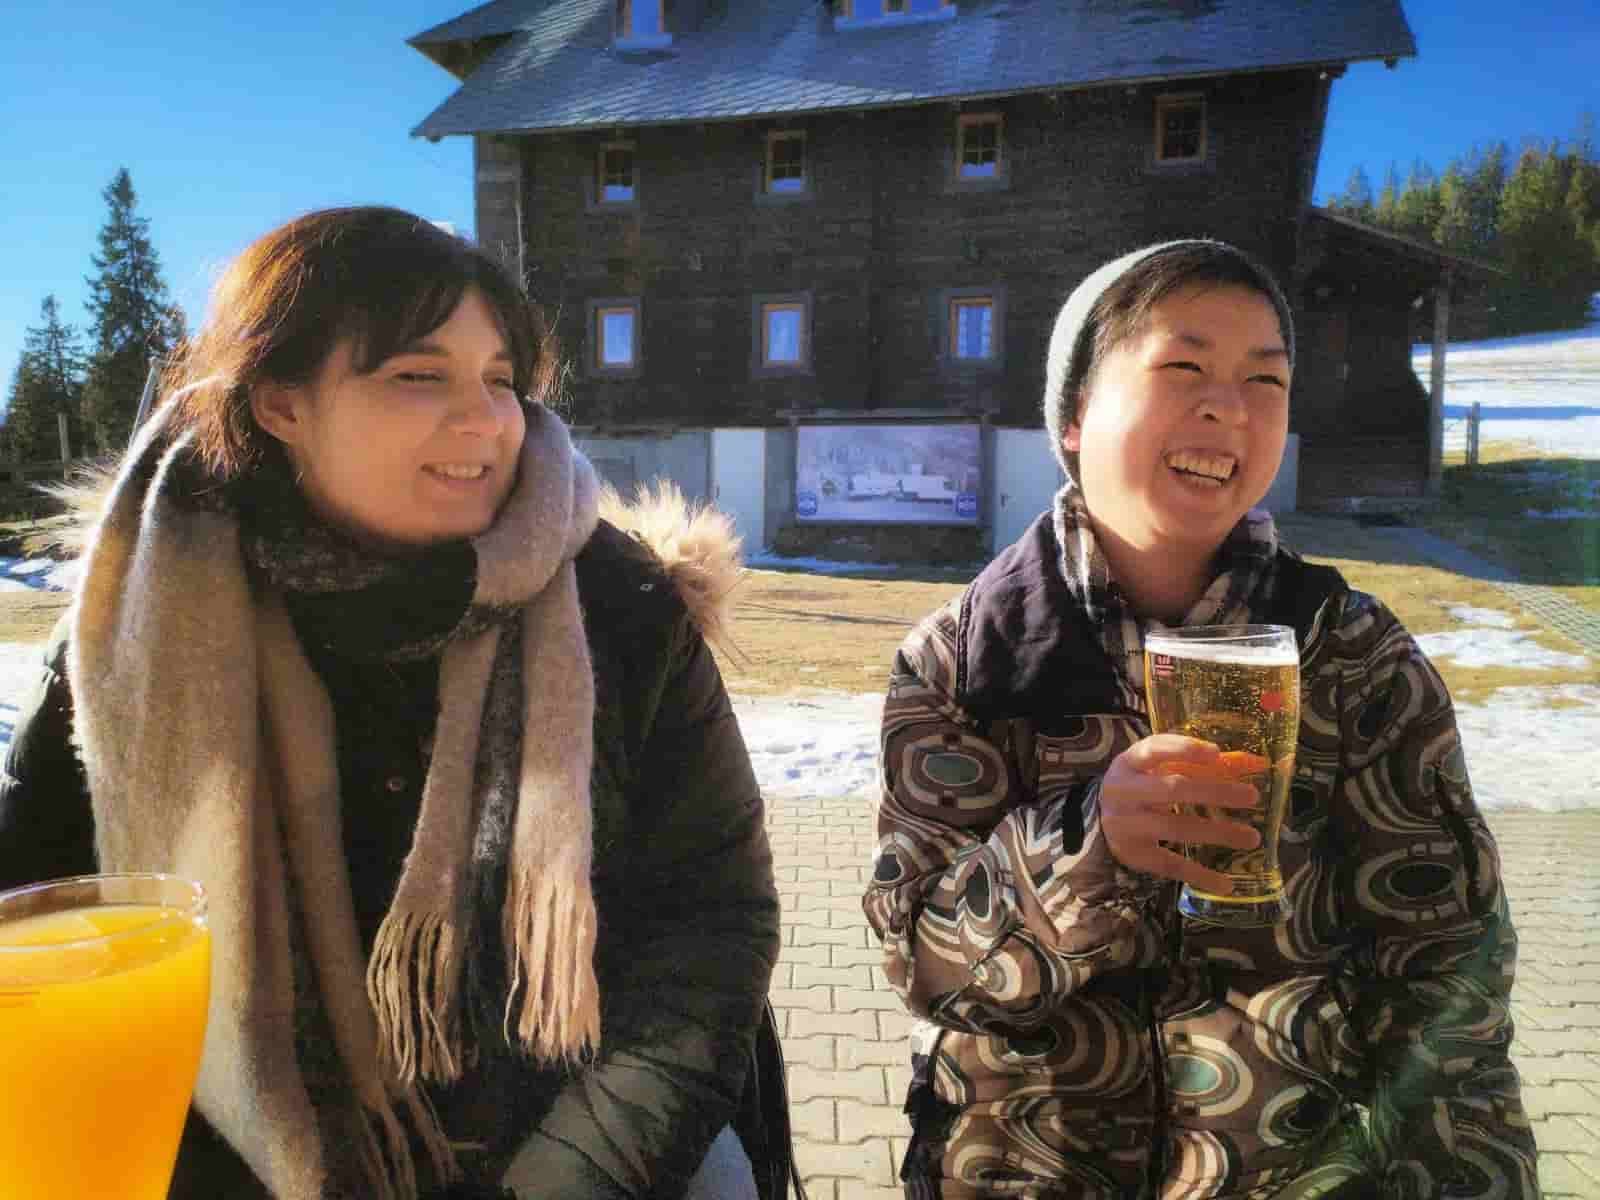 Anja und Kathi bei der Jause - Rodelausflug - The Flow Family